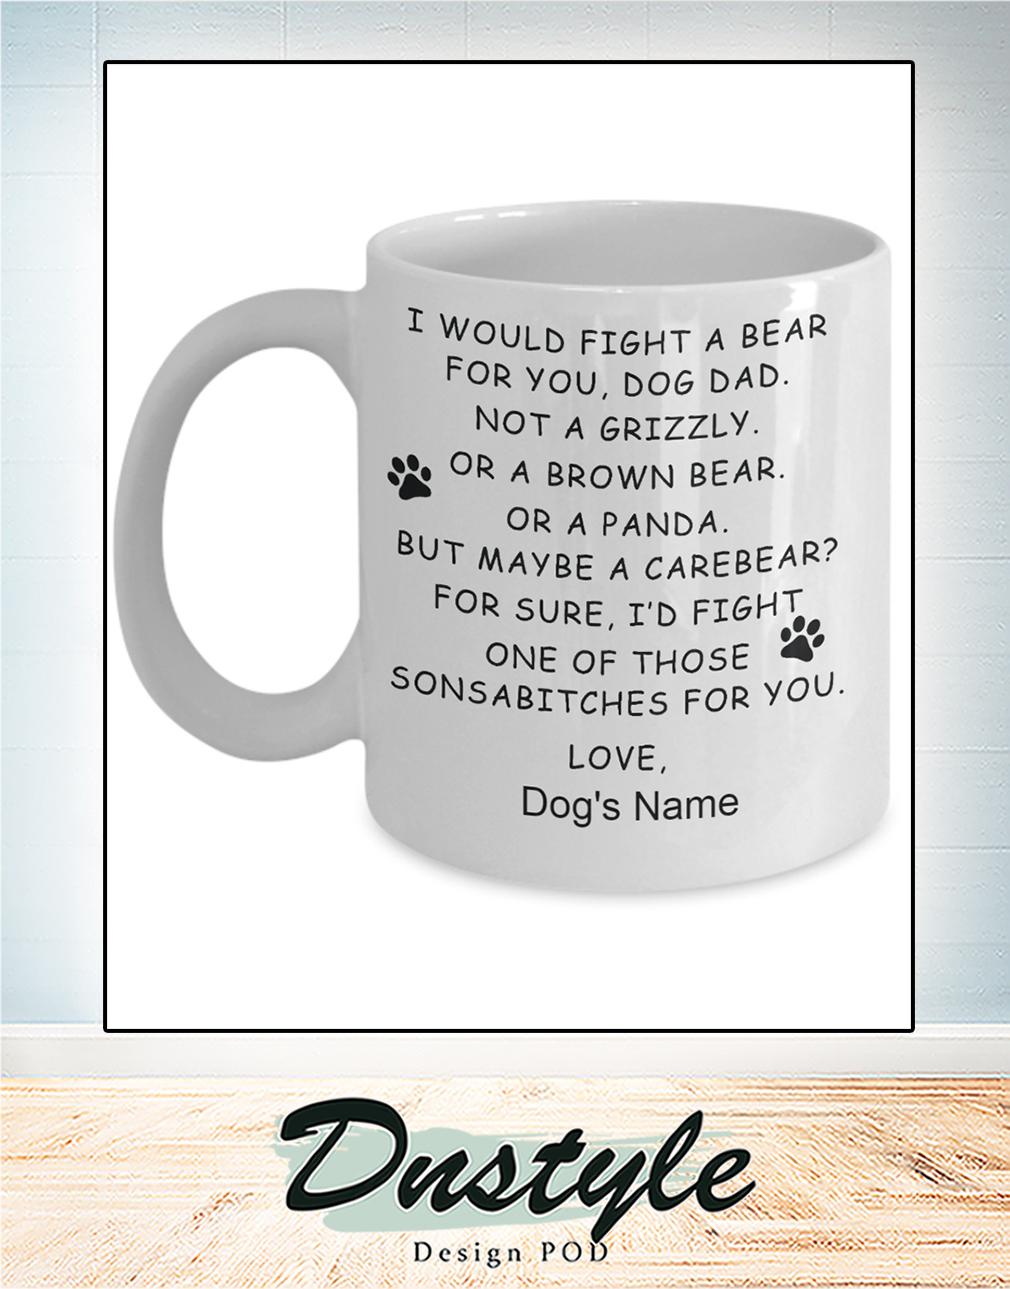 I would fight a bear for you dog dad mug